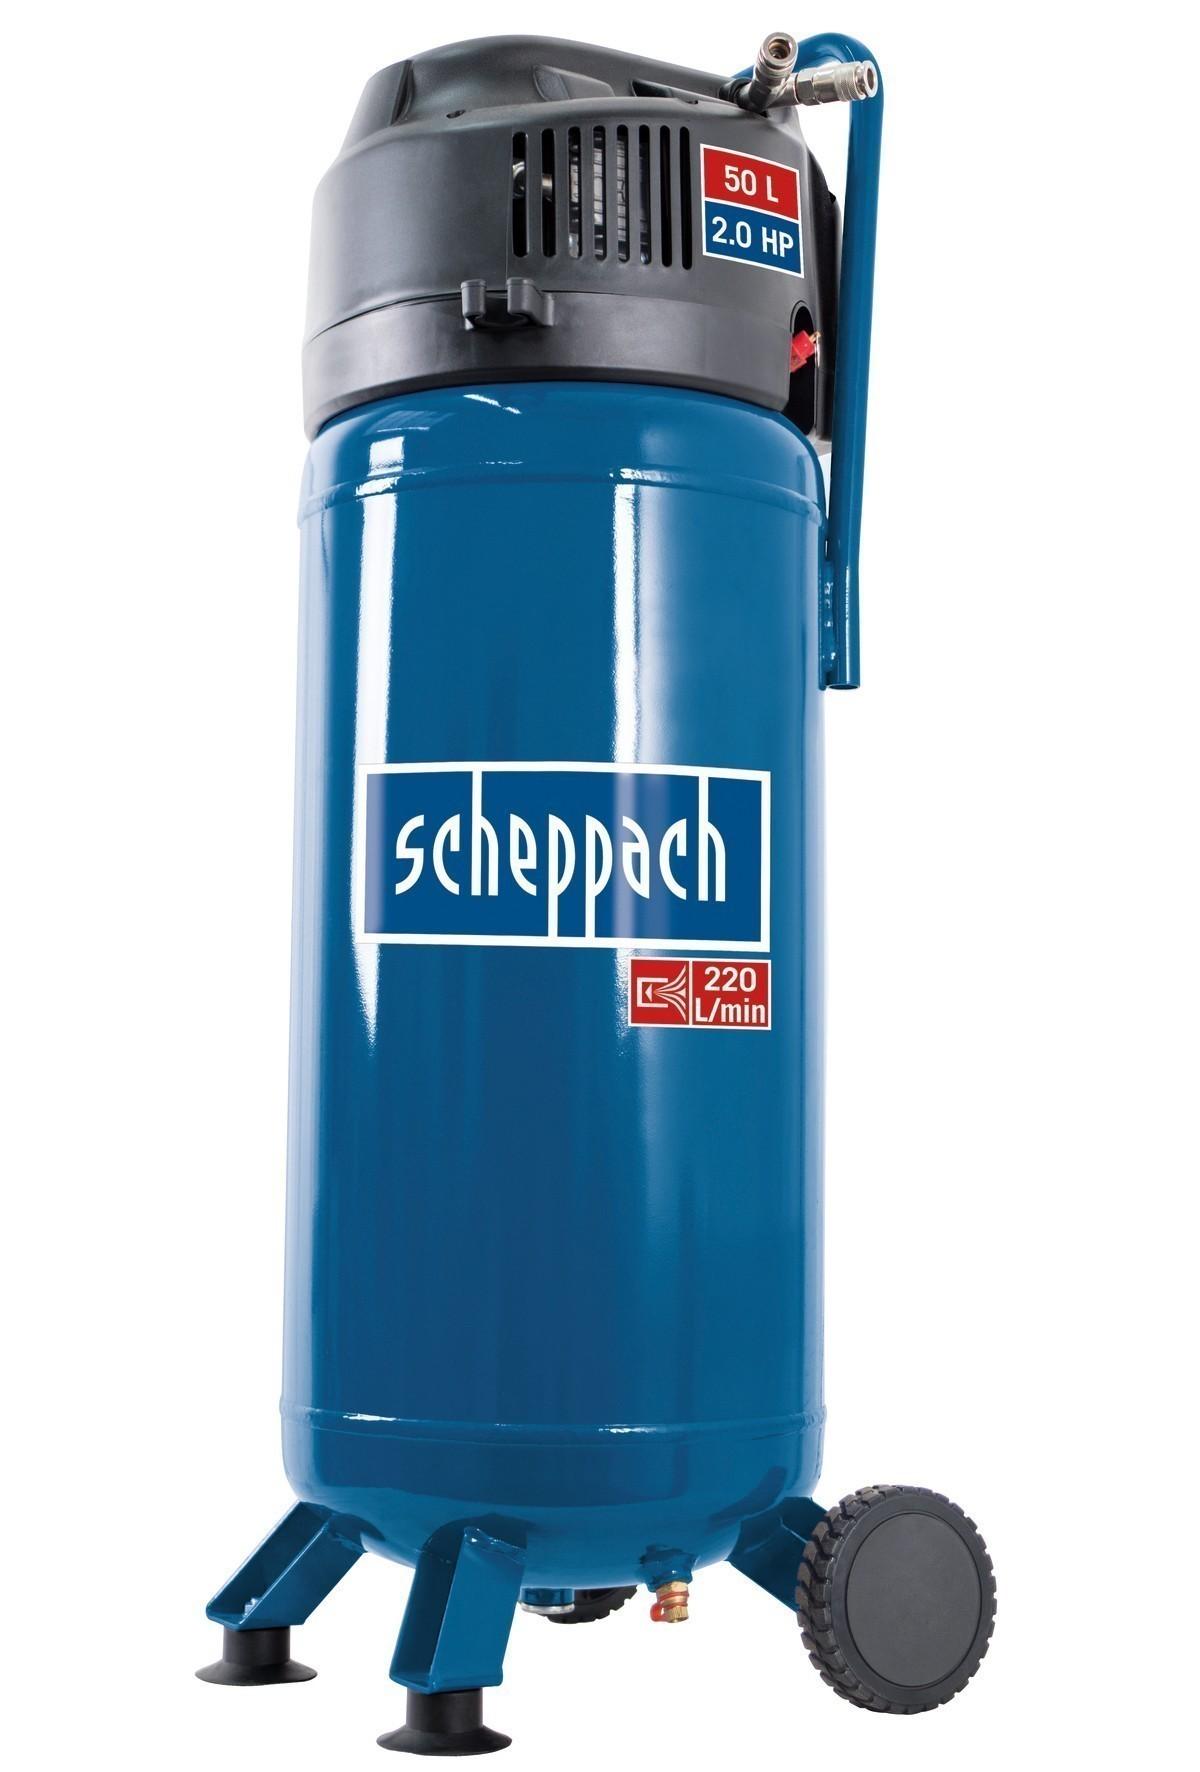 Scheppach Kompressor HC51V 10 bar 50 Liter 230V 1500W Bild 1